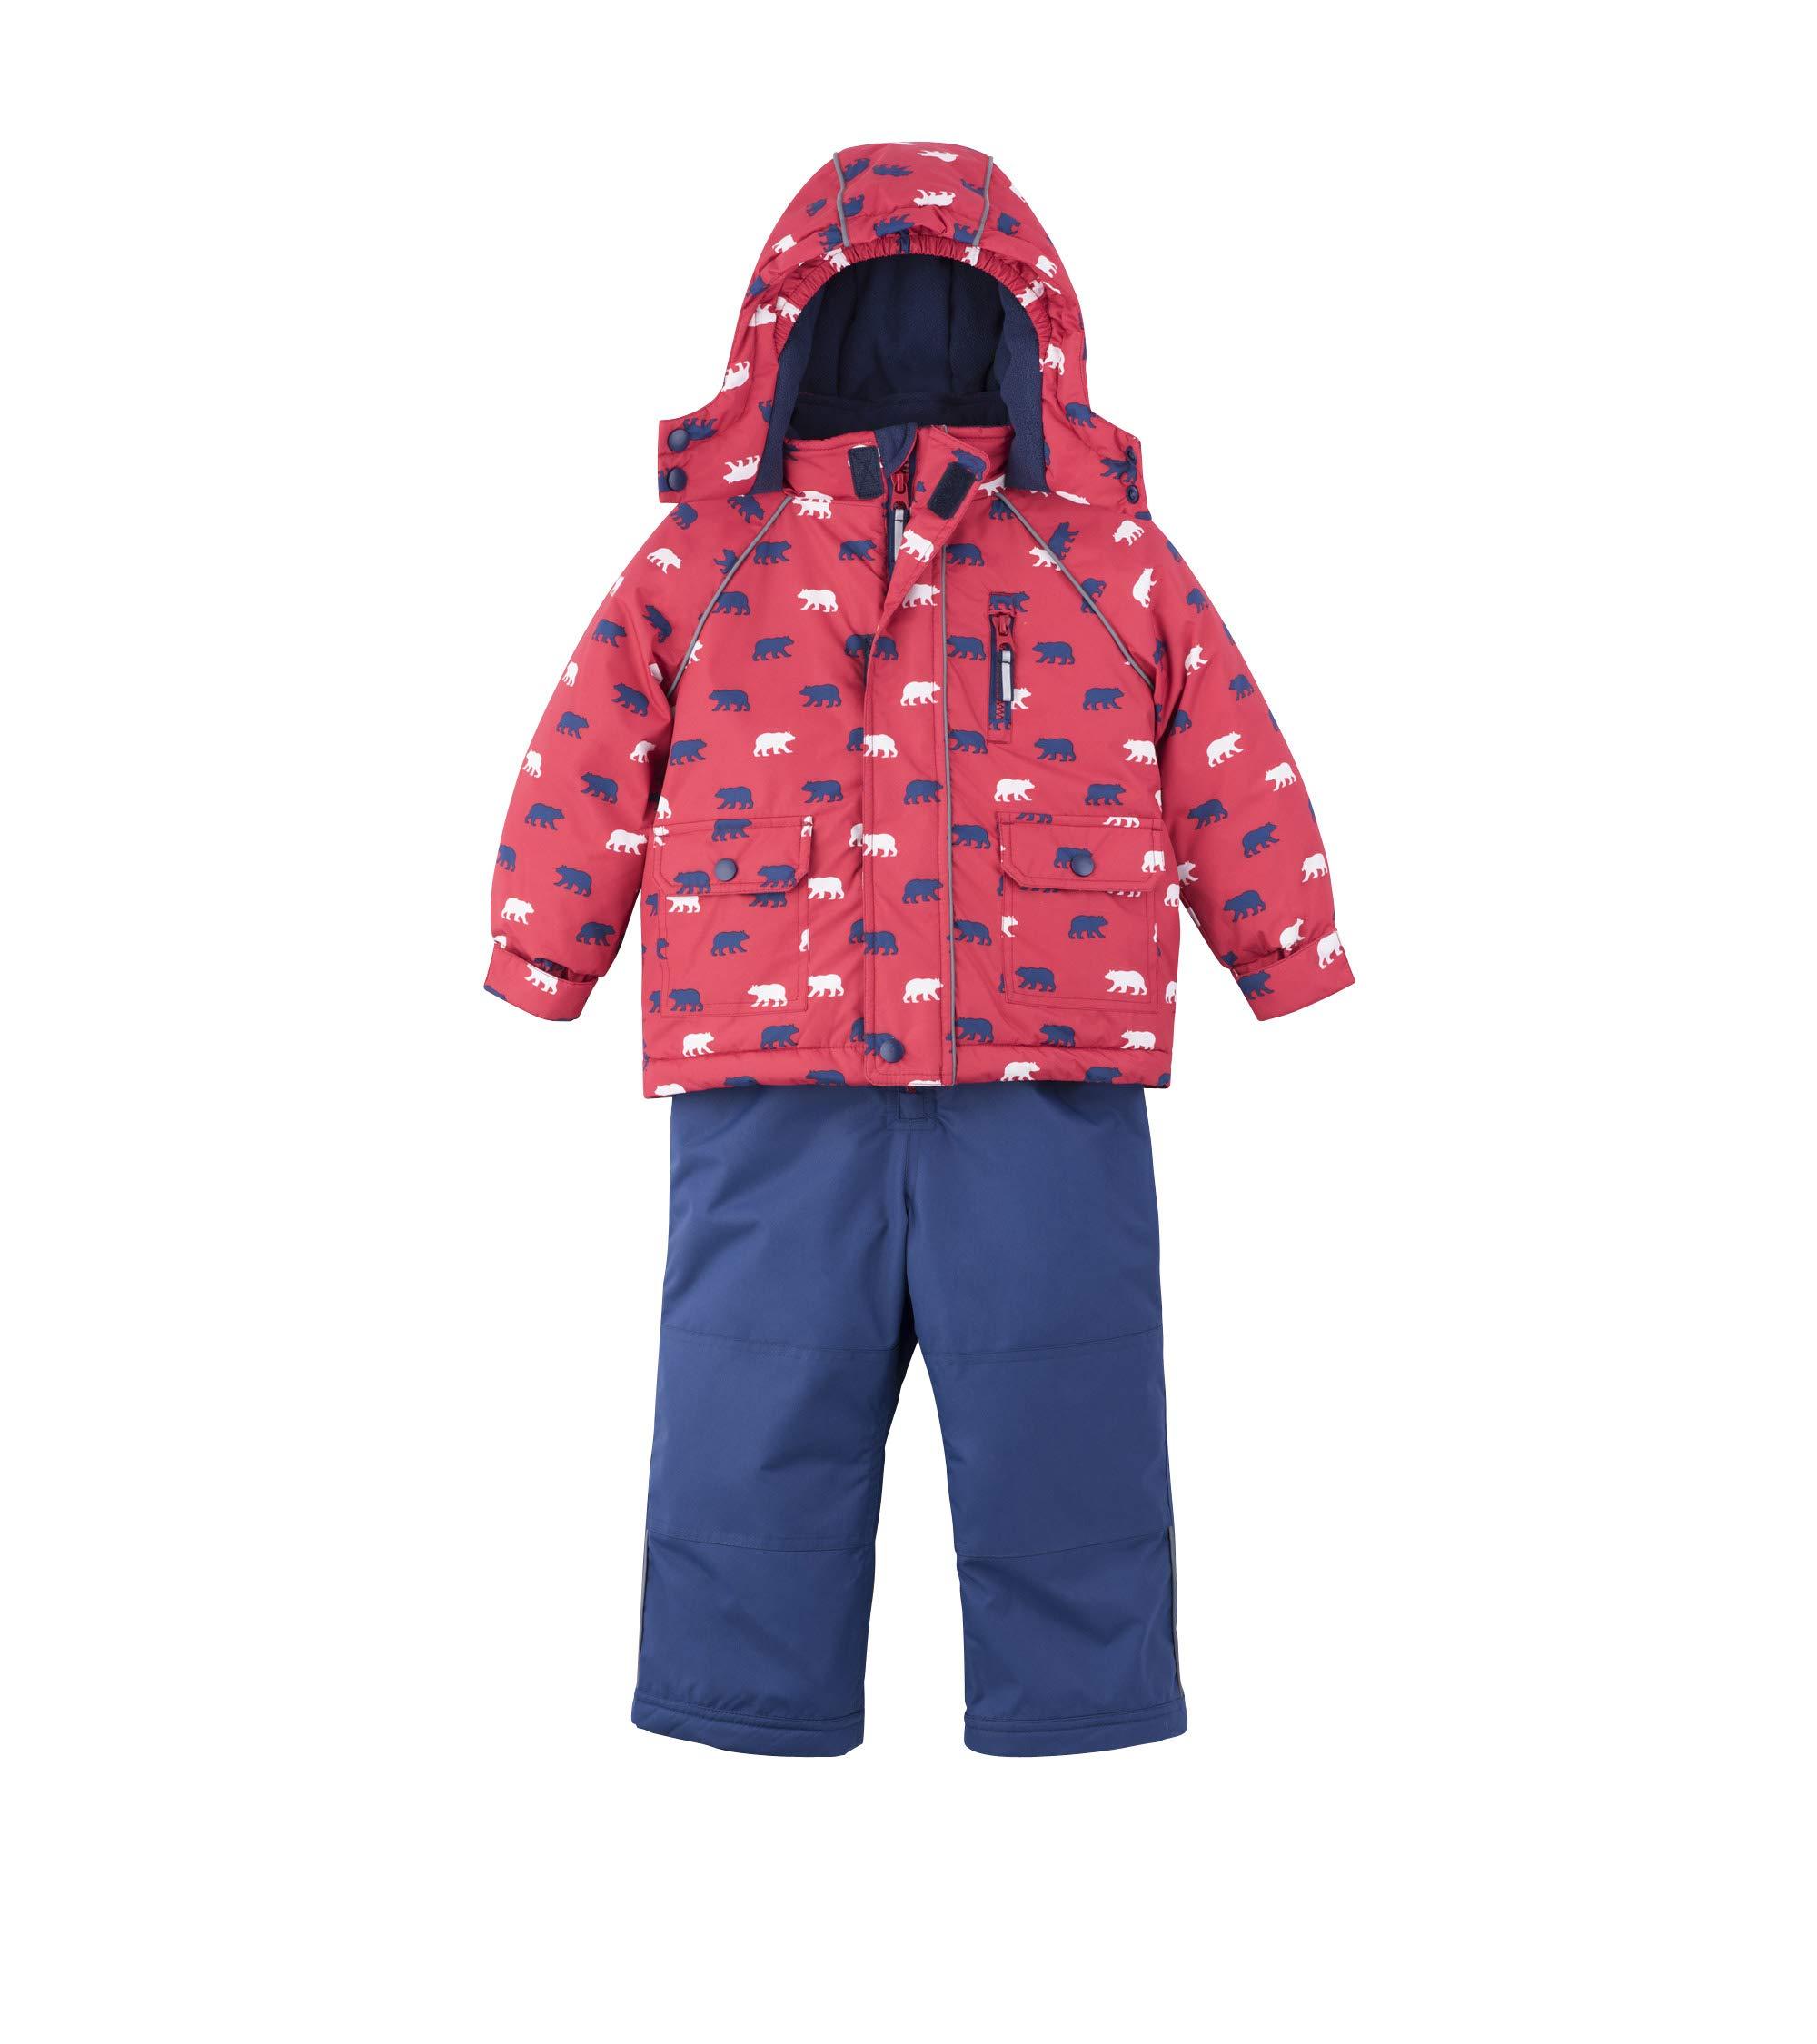 Hatley Boys' Toddler Snow Suit Set, Polar Bear 5 Years